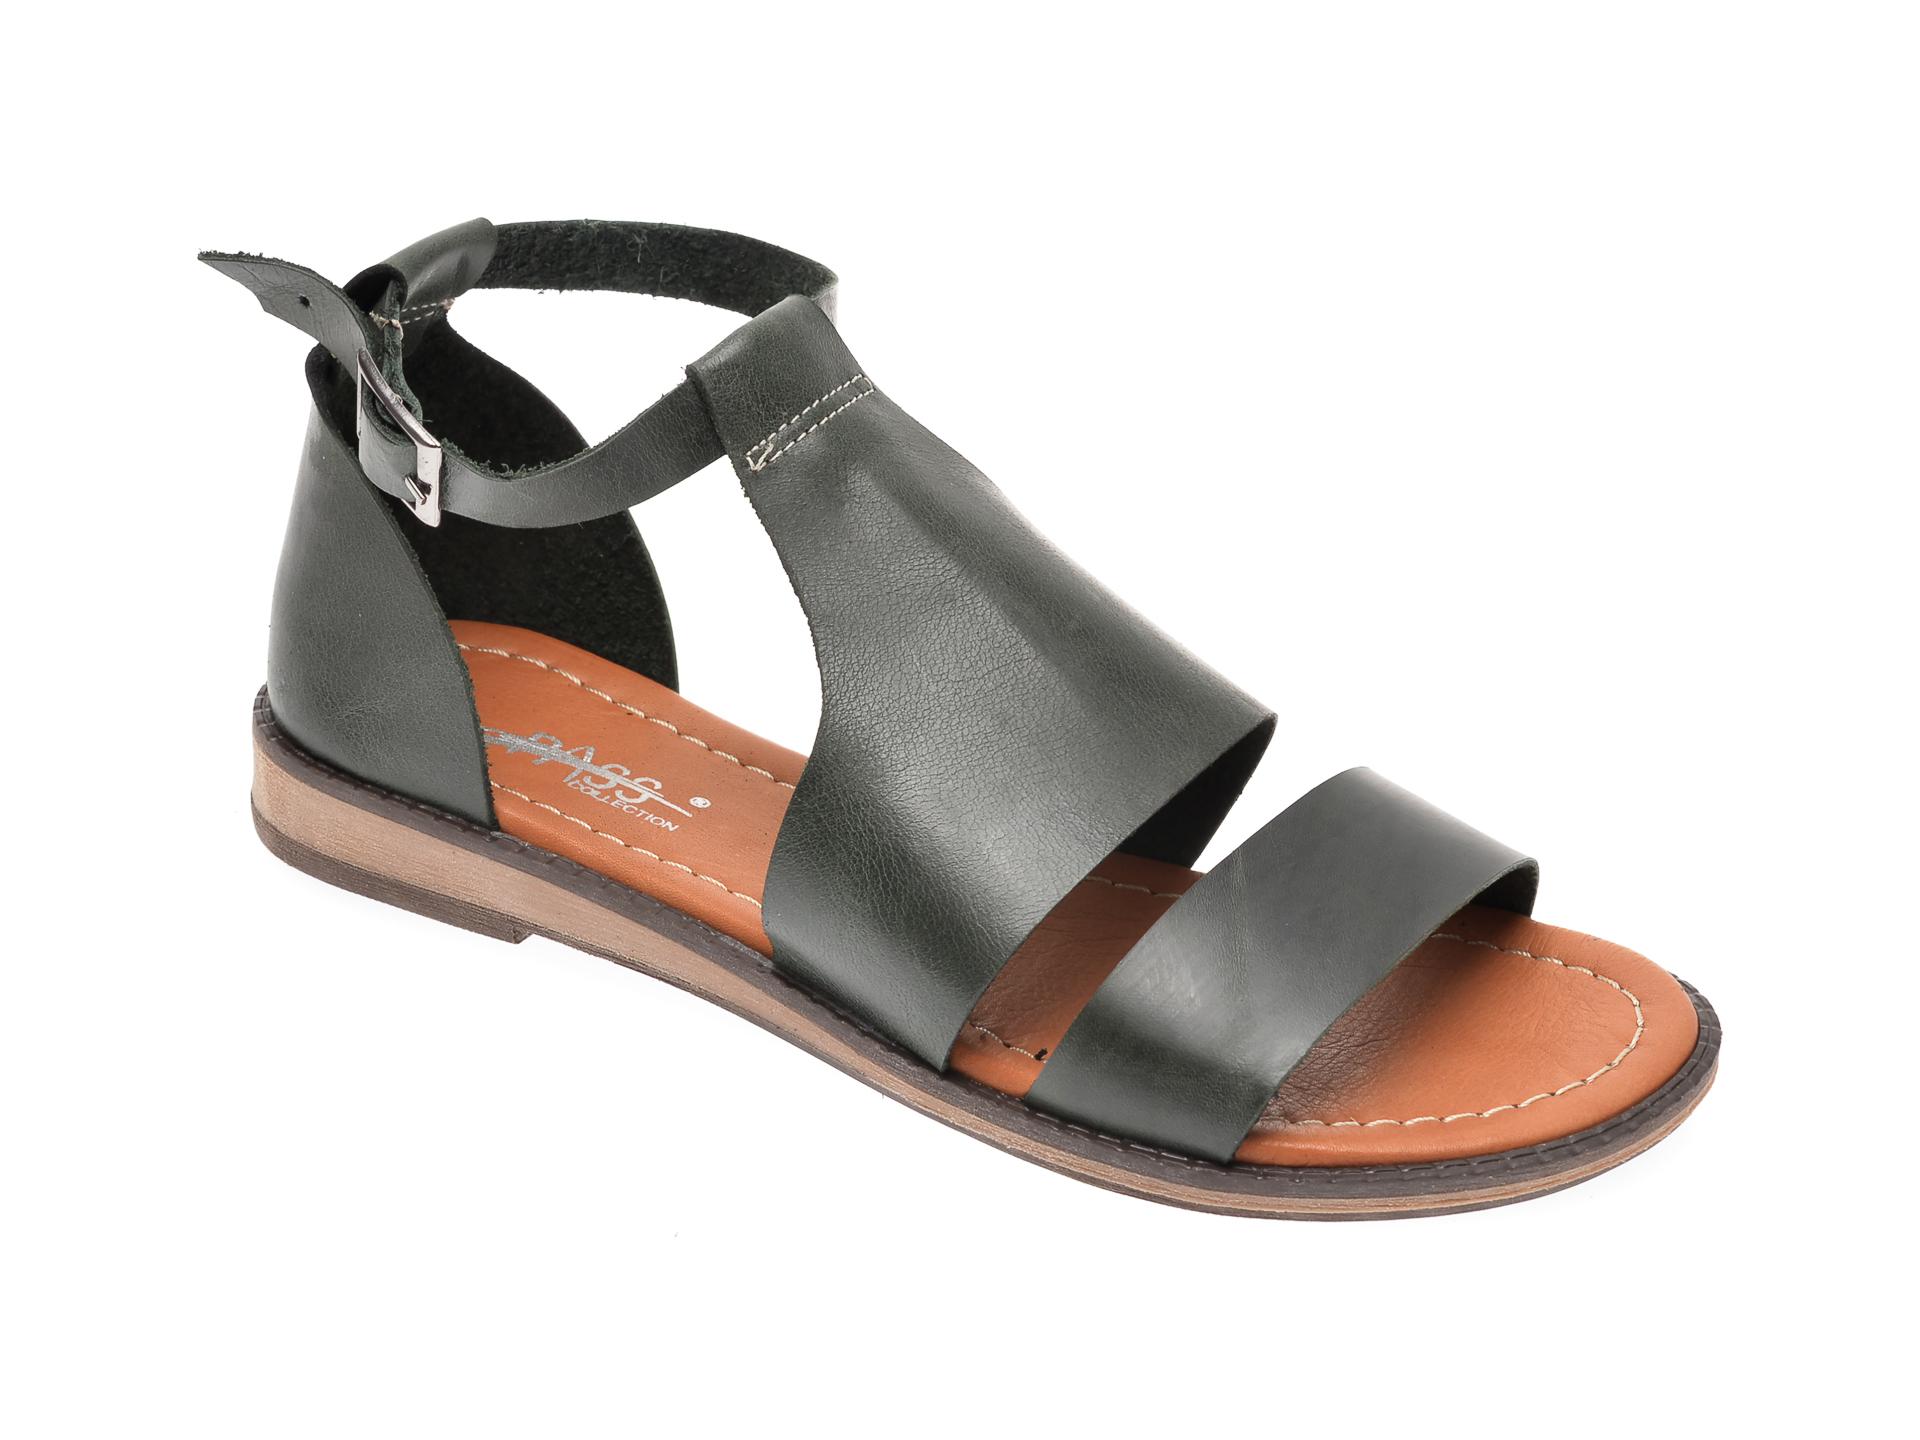 Sandale PASS COLLECTION verzi, 1004K, din piele naturala